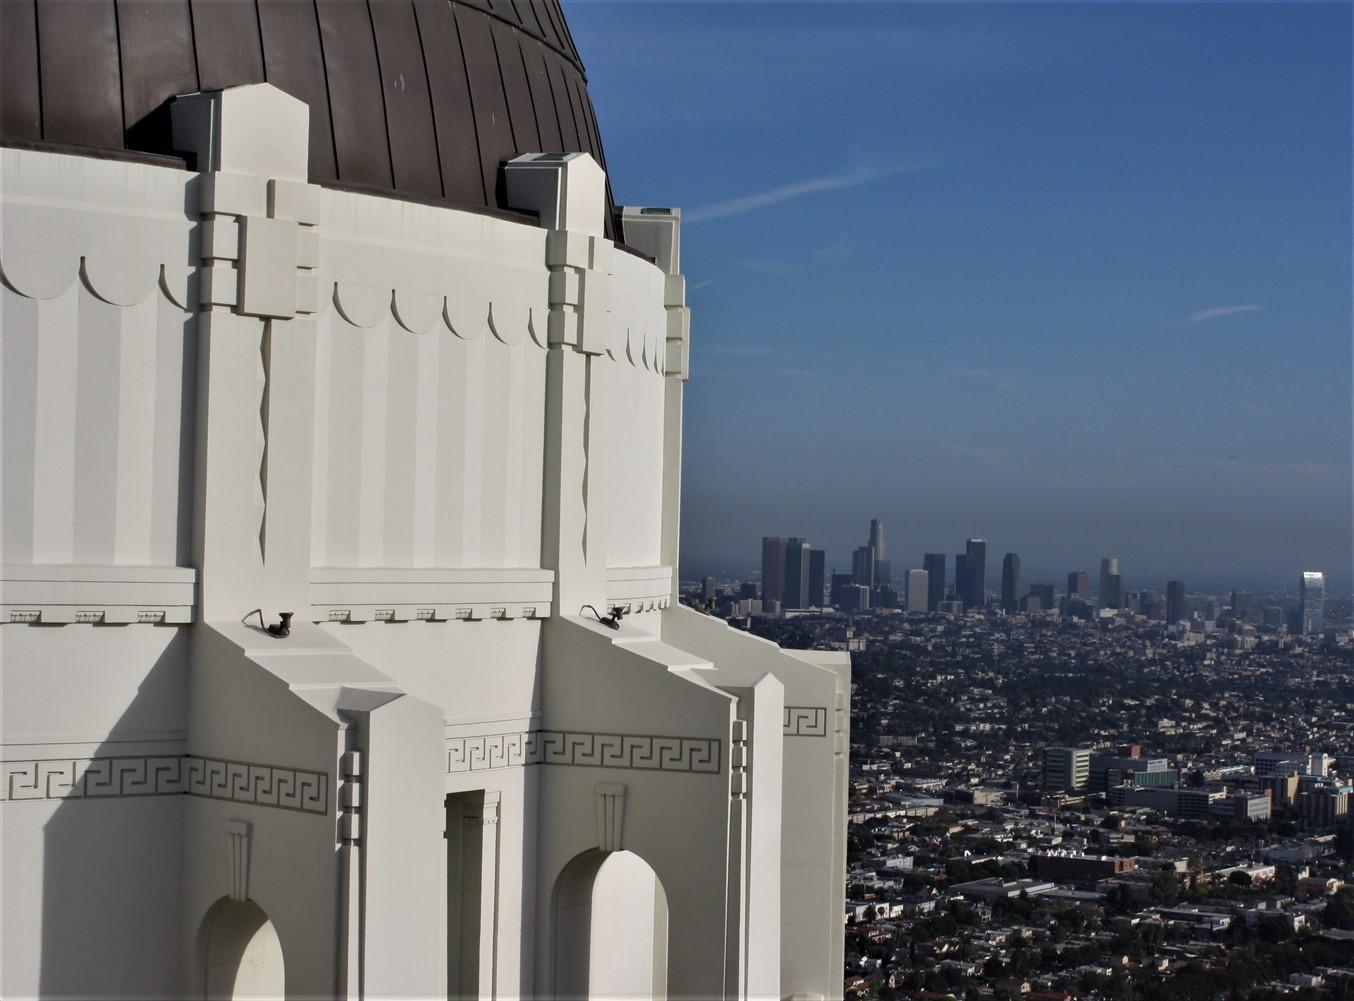 2012 03 10 144 Los Angeles Griffith Park.jpg